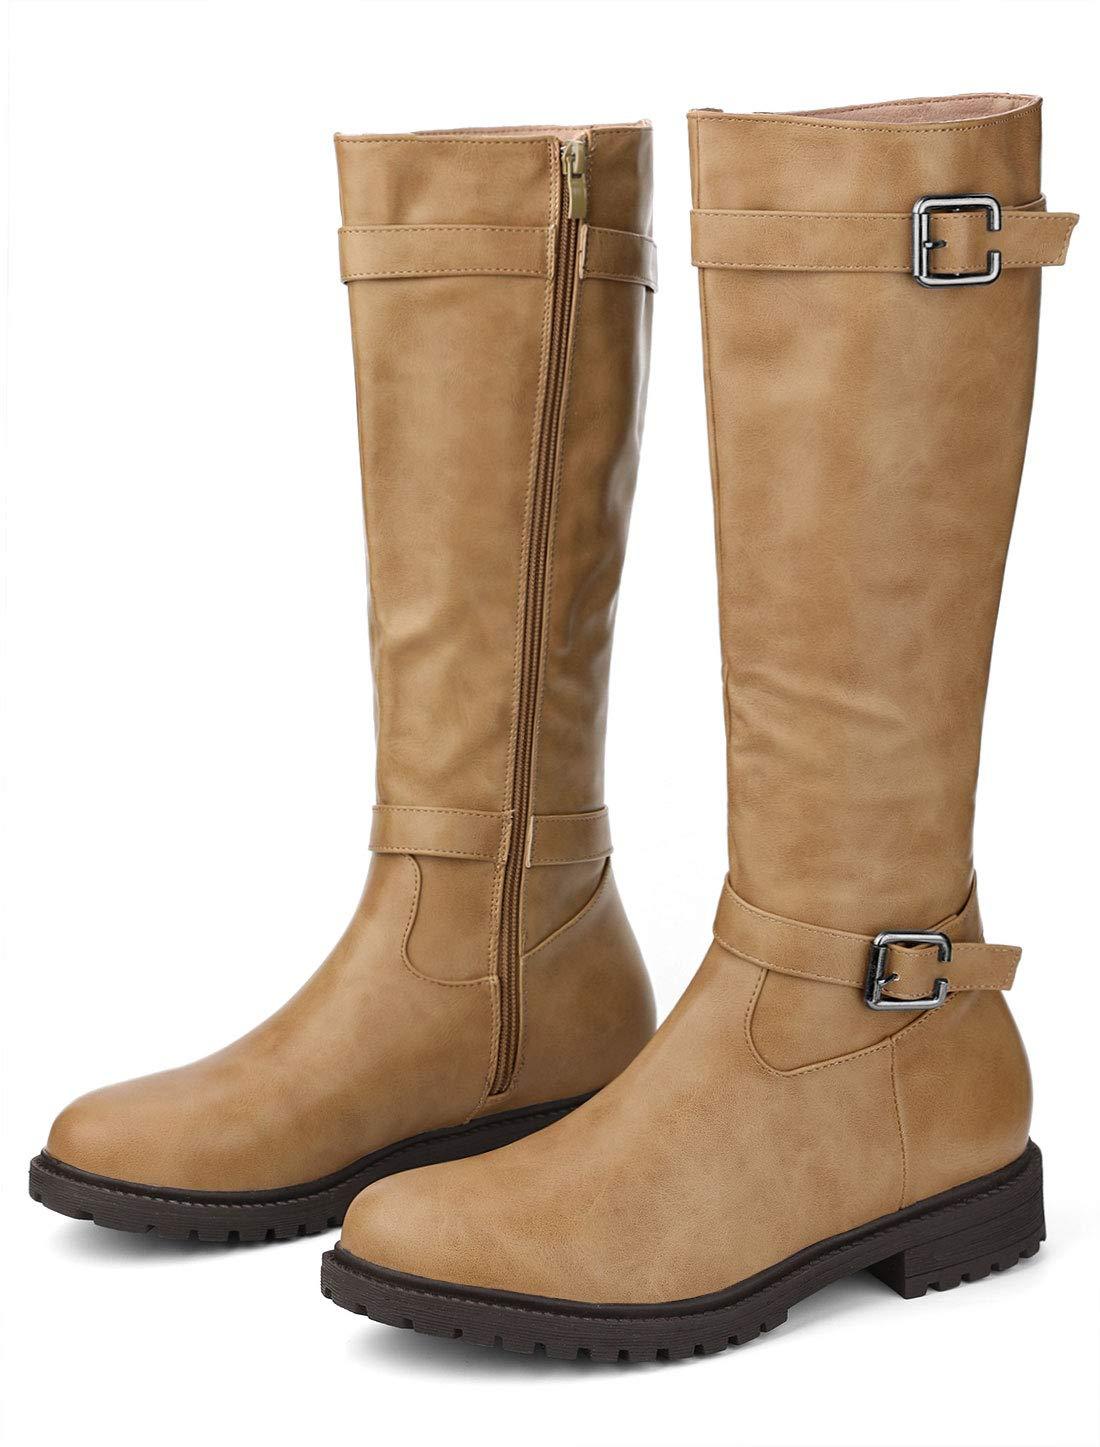 Allegra K Women's Buckle Decor Zip Knee High Riding Boots